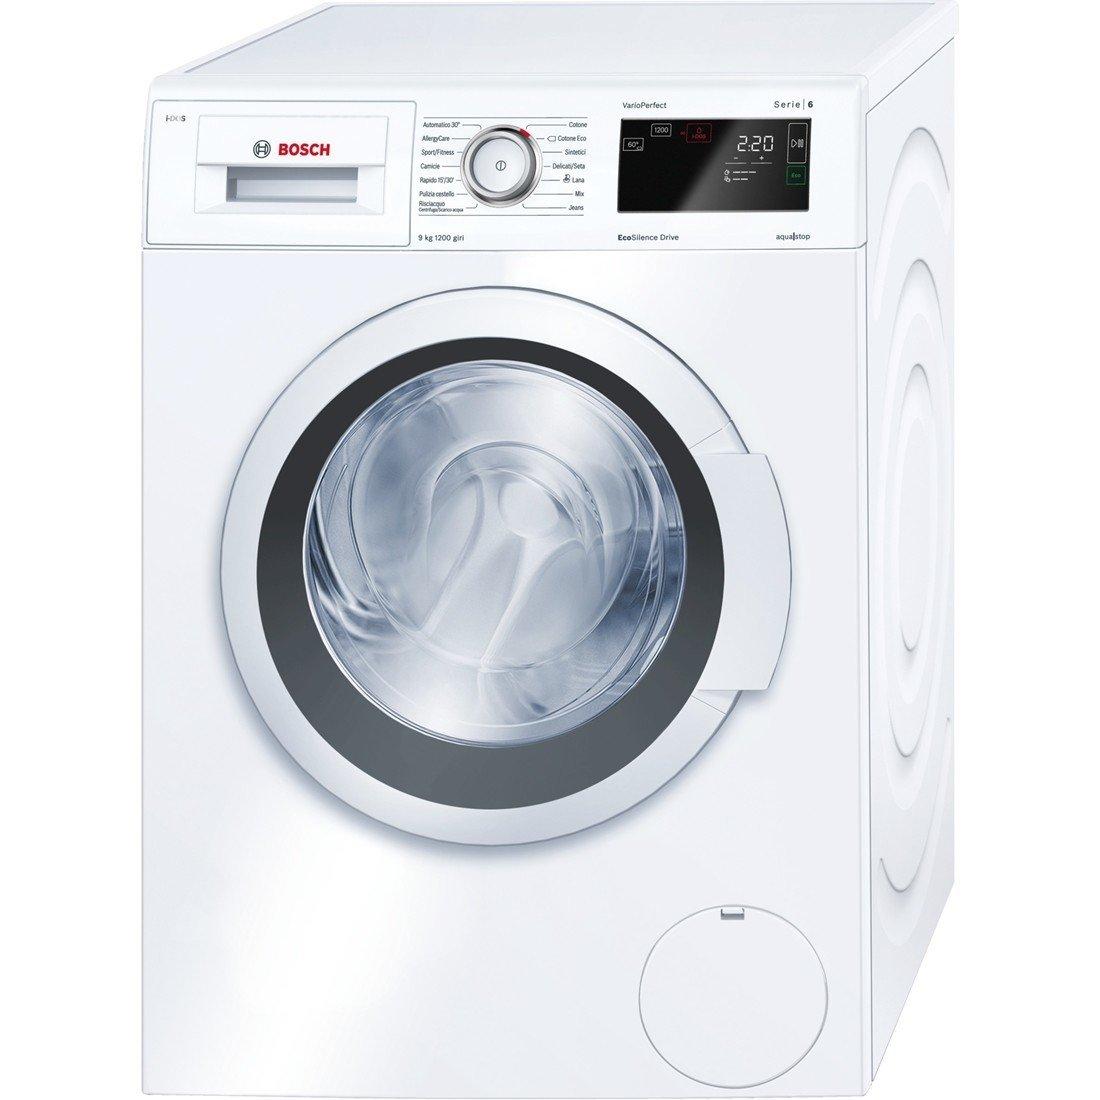 Bosch Lavadora wat24609it Vario Perfect 9 kg clase A + + + ...